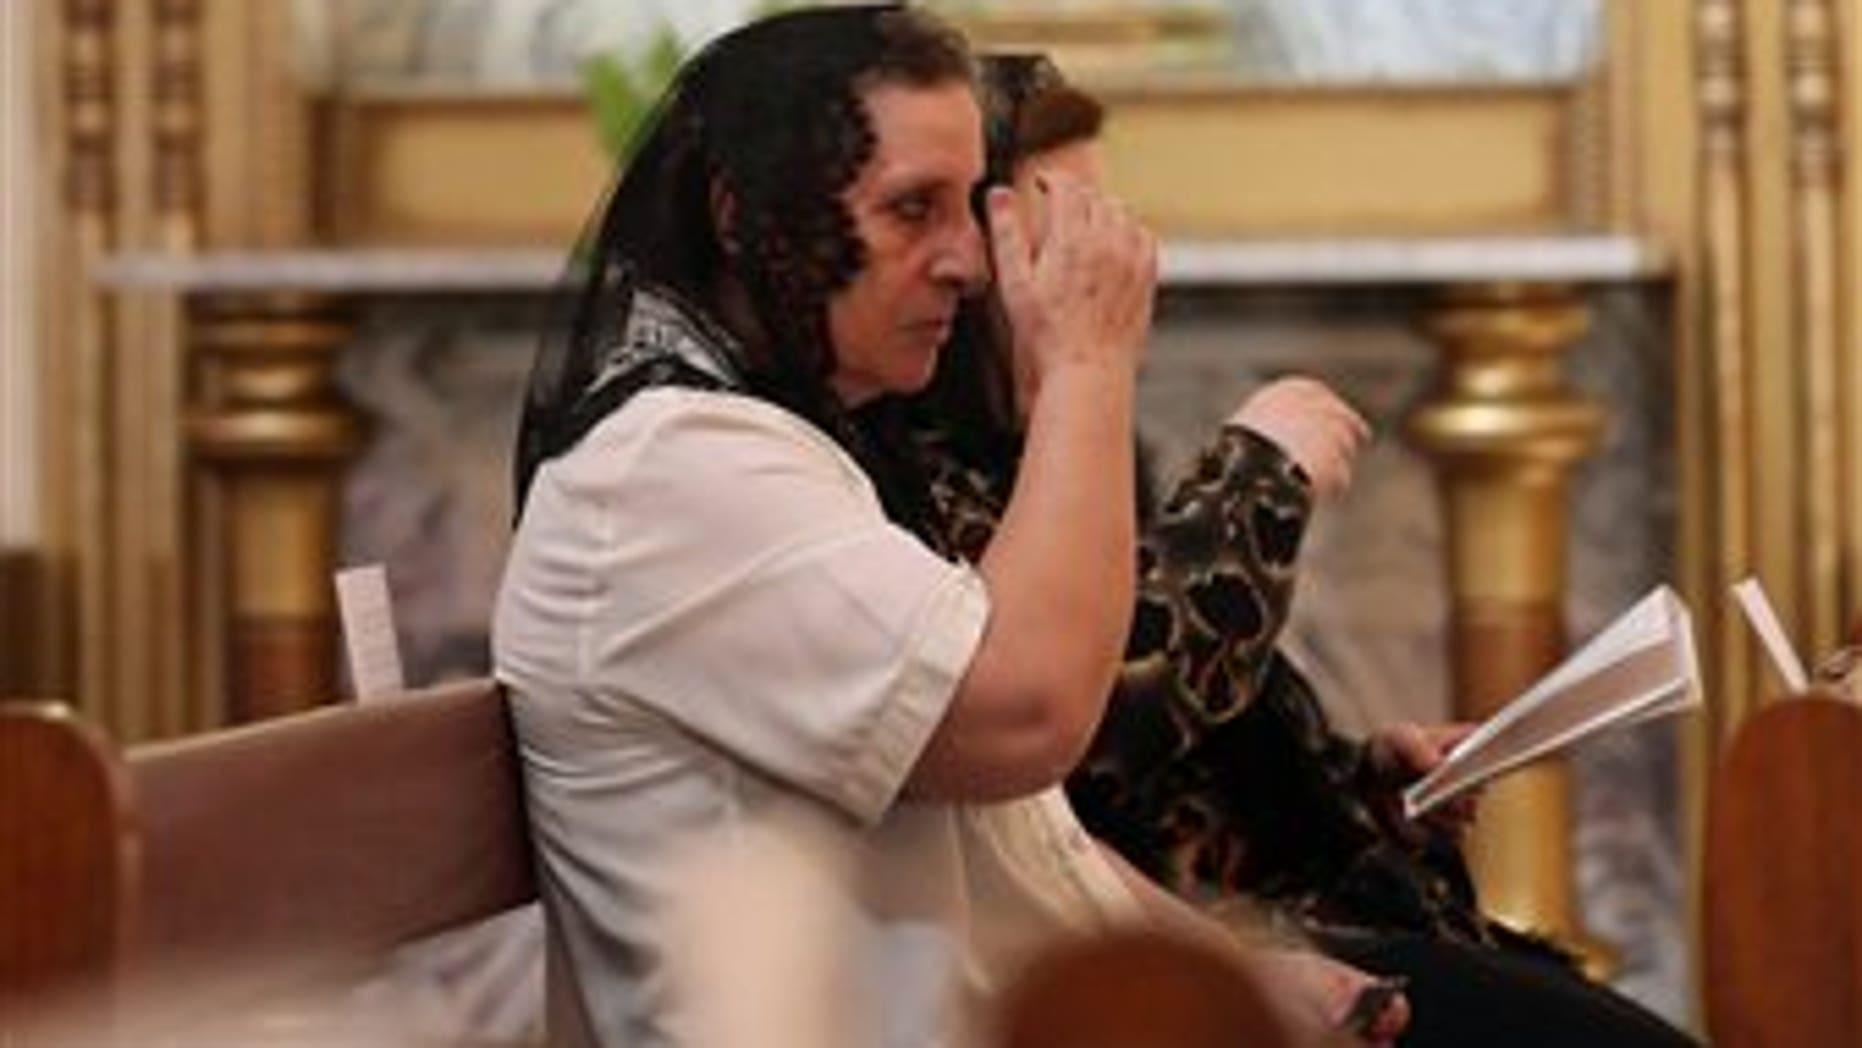 Iraqi Christians pray during Sunday Mass at the Church of Virgin Mary in Baghdad, Sunday, July 27, 2014. (AP Photo/Hadi Mizban)